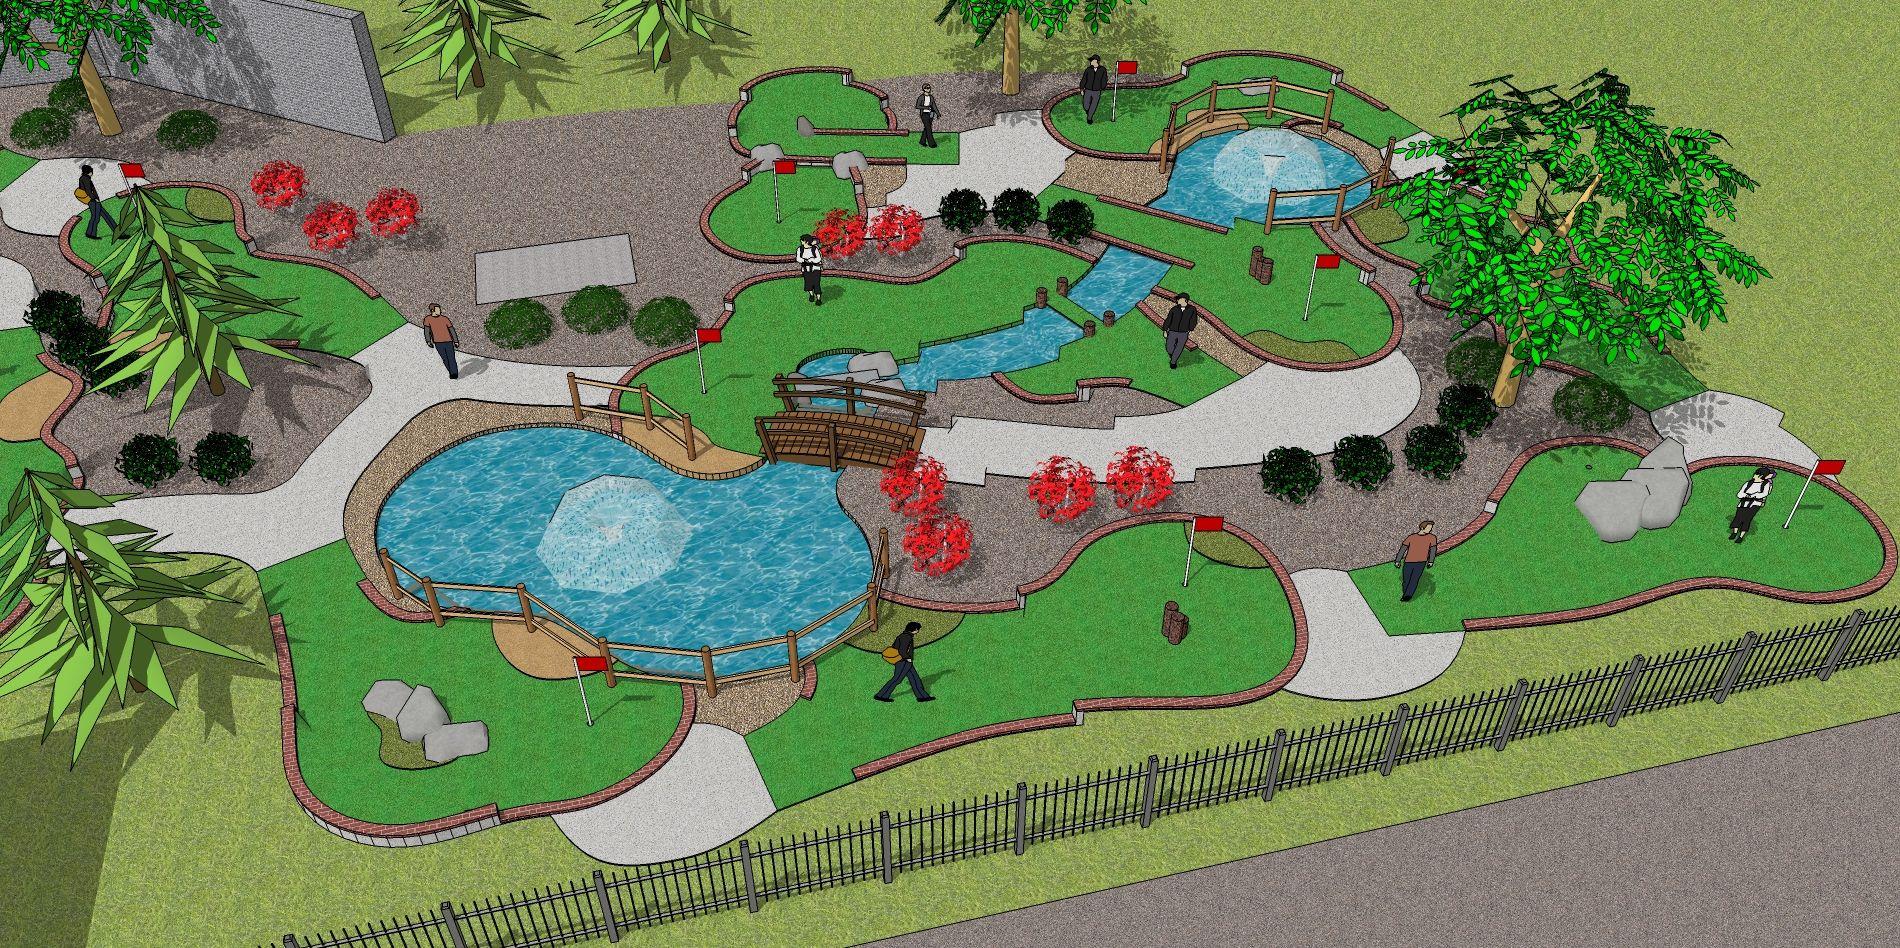 drawings of mini golf courses for permits - Google Search | mini ...